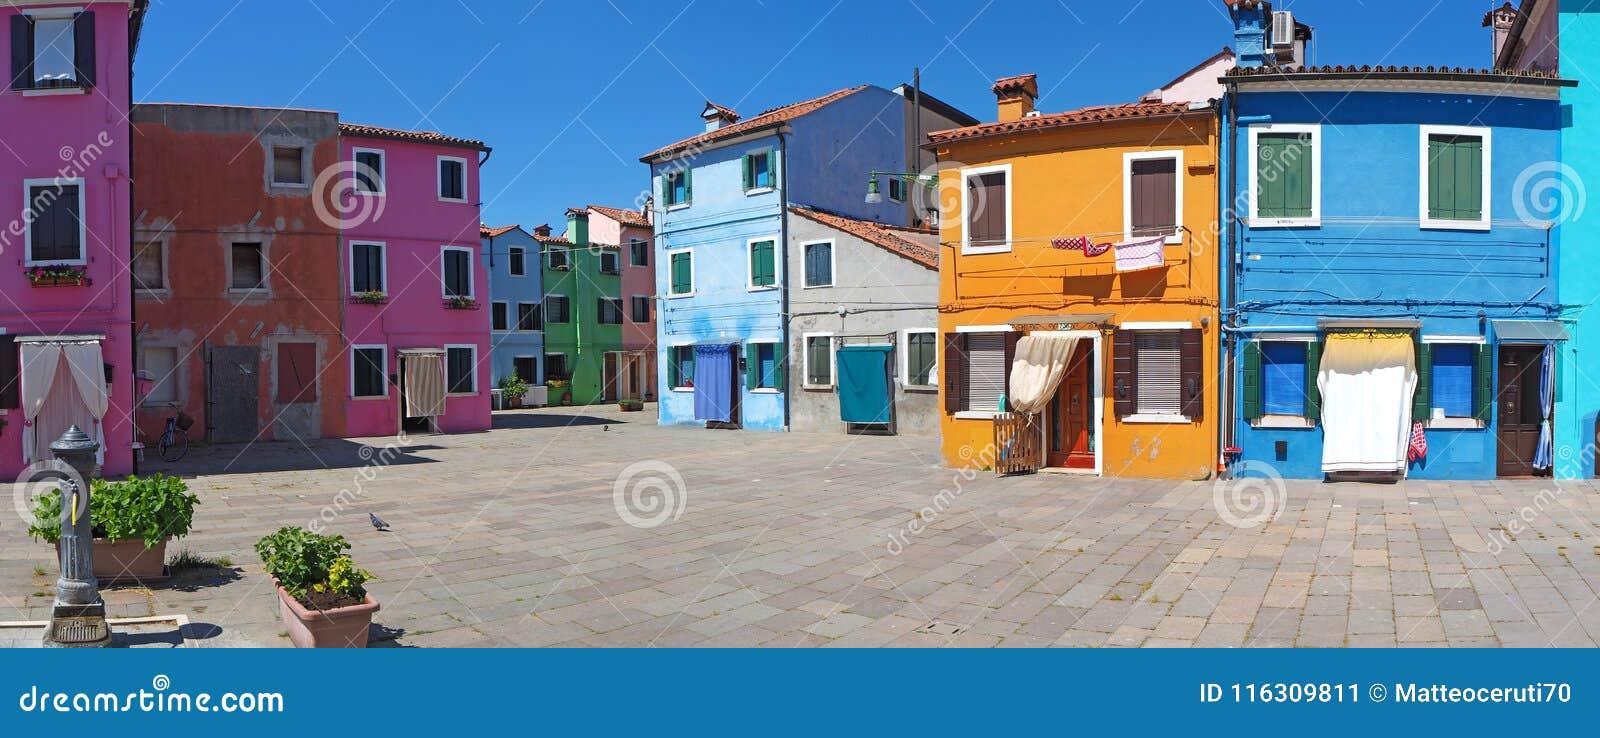 Burano, Venezia, Italien Straße mit bunten Häusern in Burano-Insel